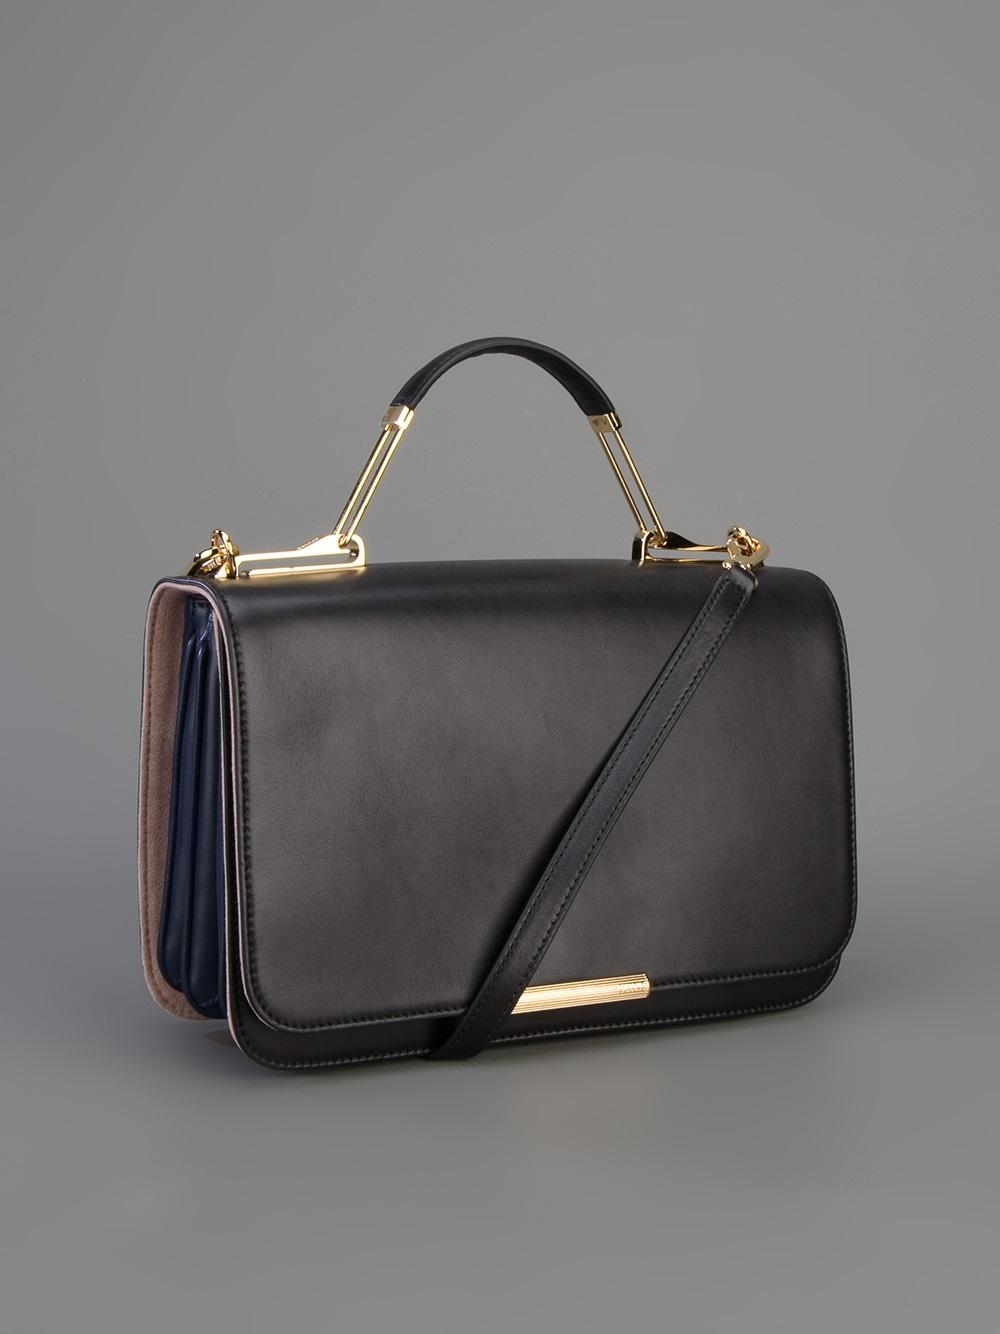 Lyst Emilio Pucci Emilio Pucci Newton Shoulder Bag In Black